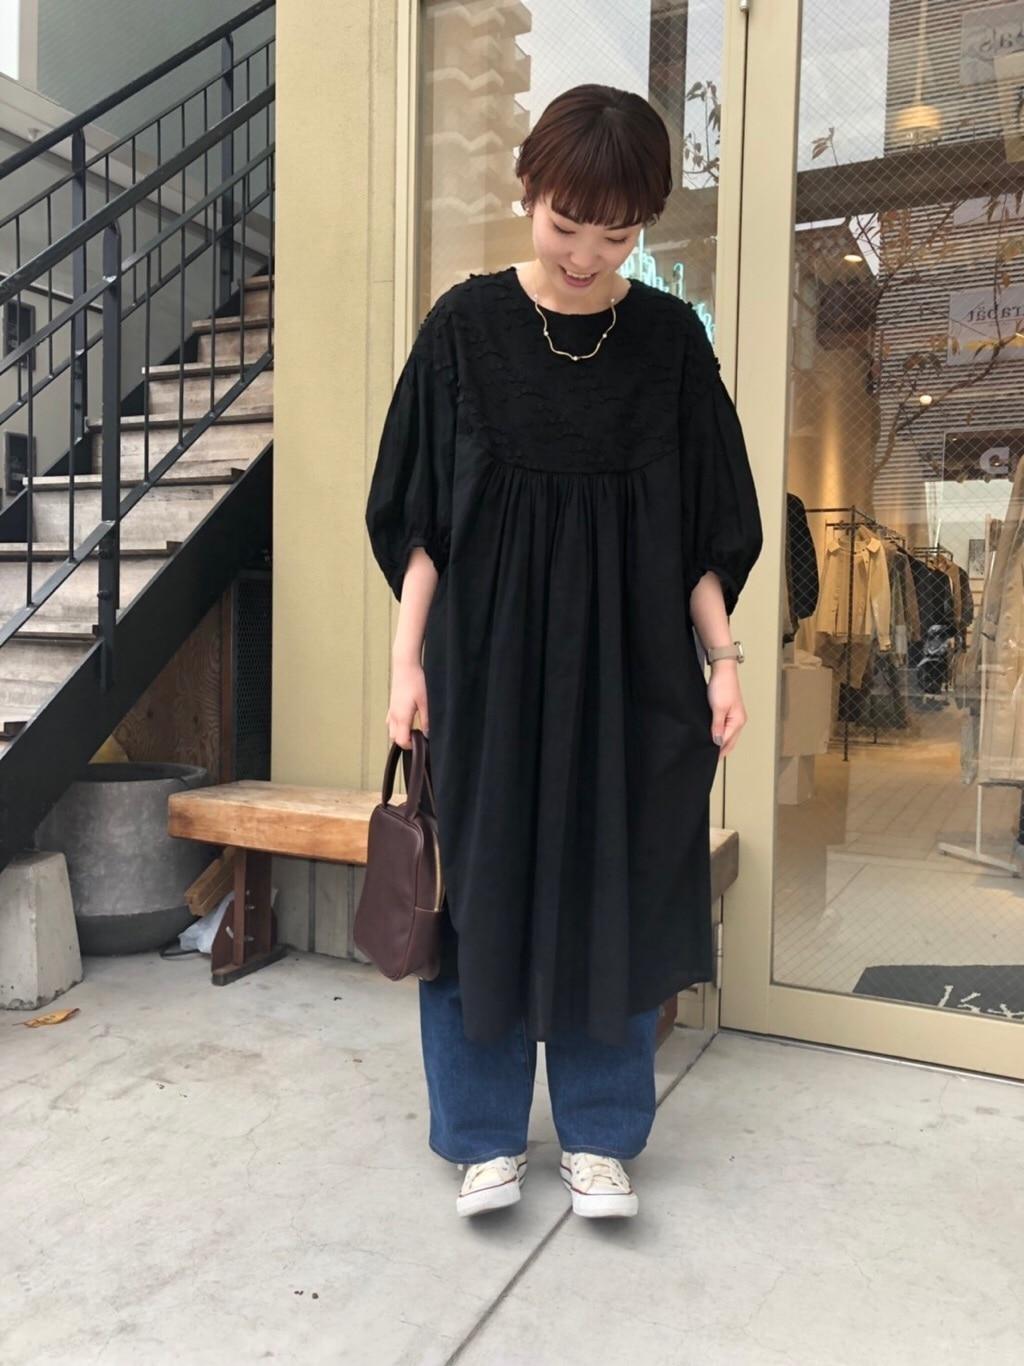 l'atelier du savon 名古屋栄路面 身長:161cm 2020.02.01